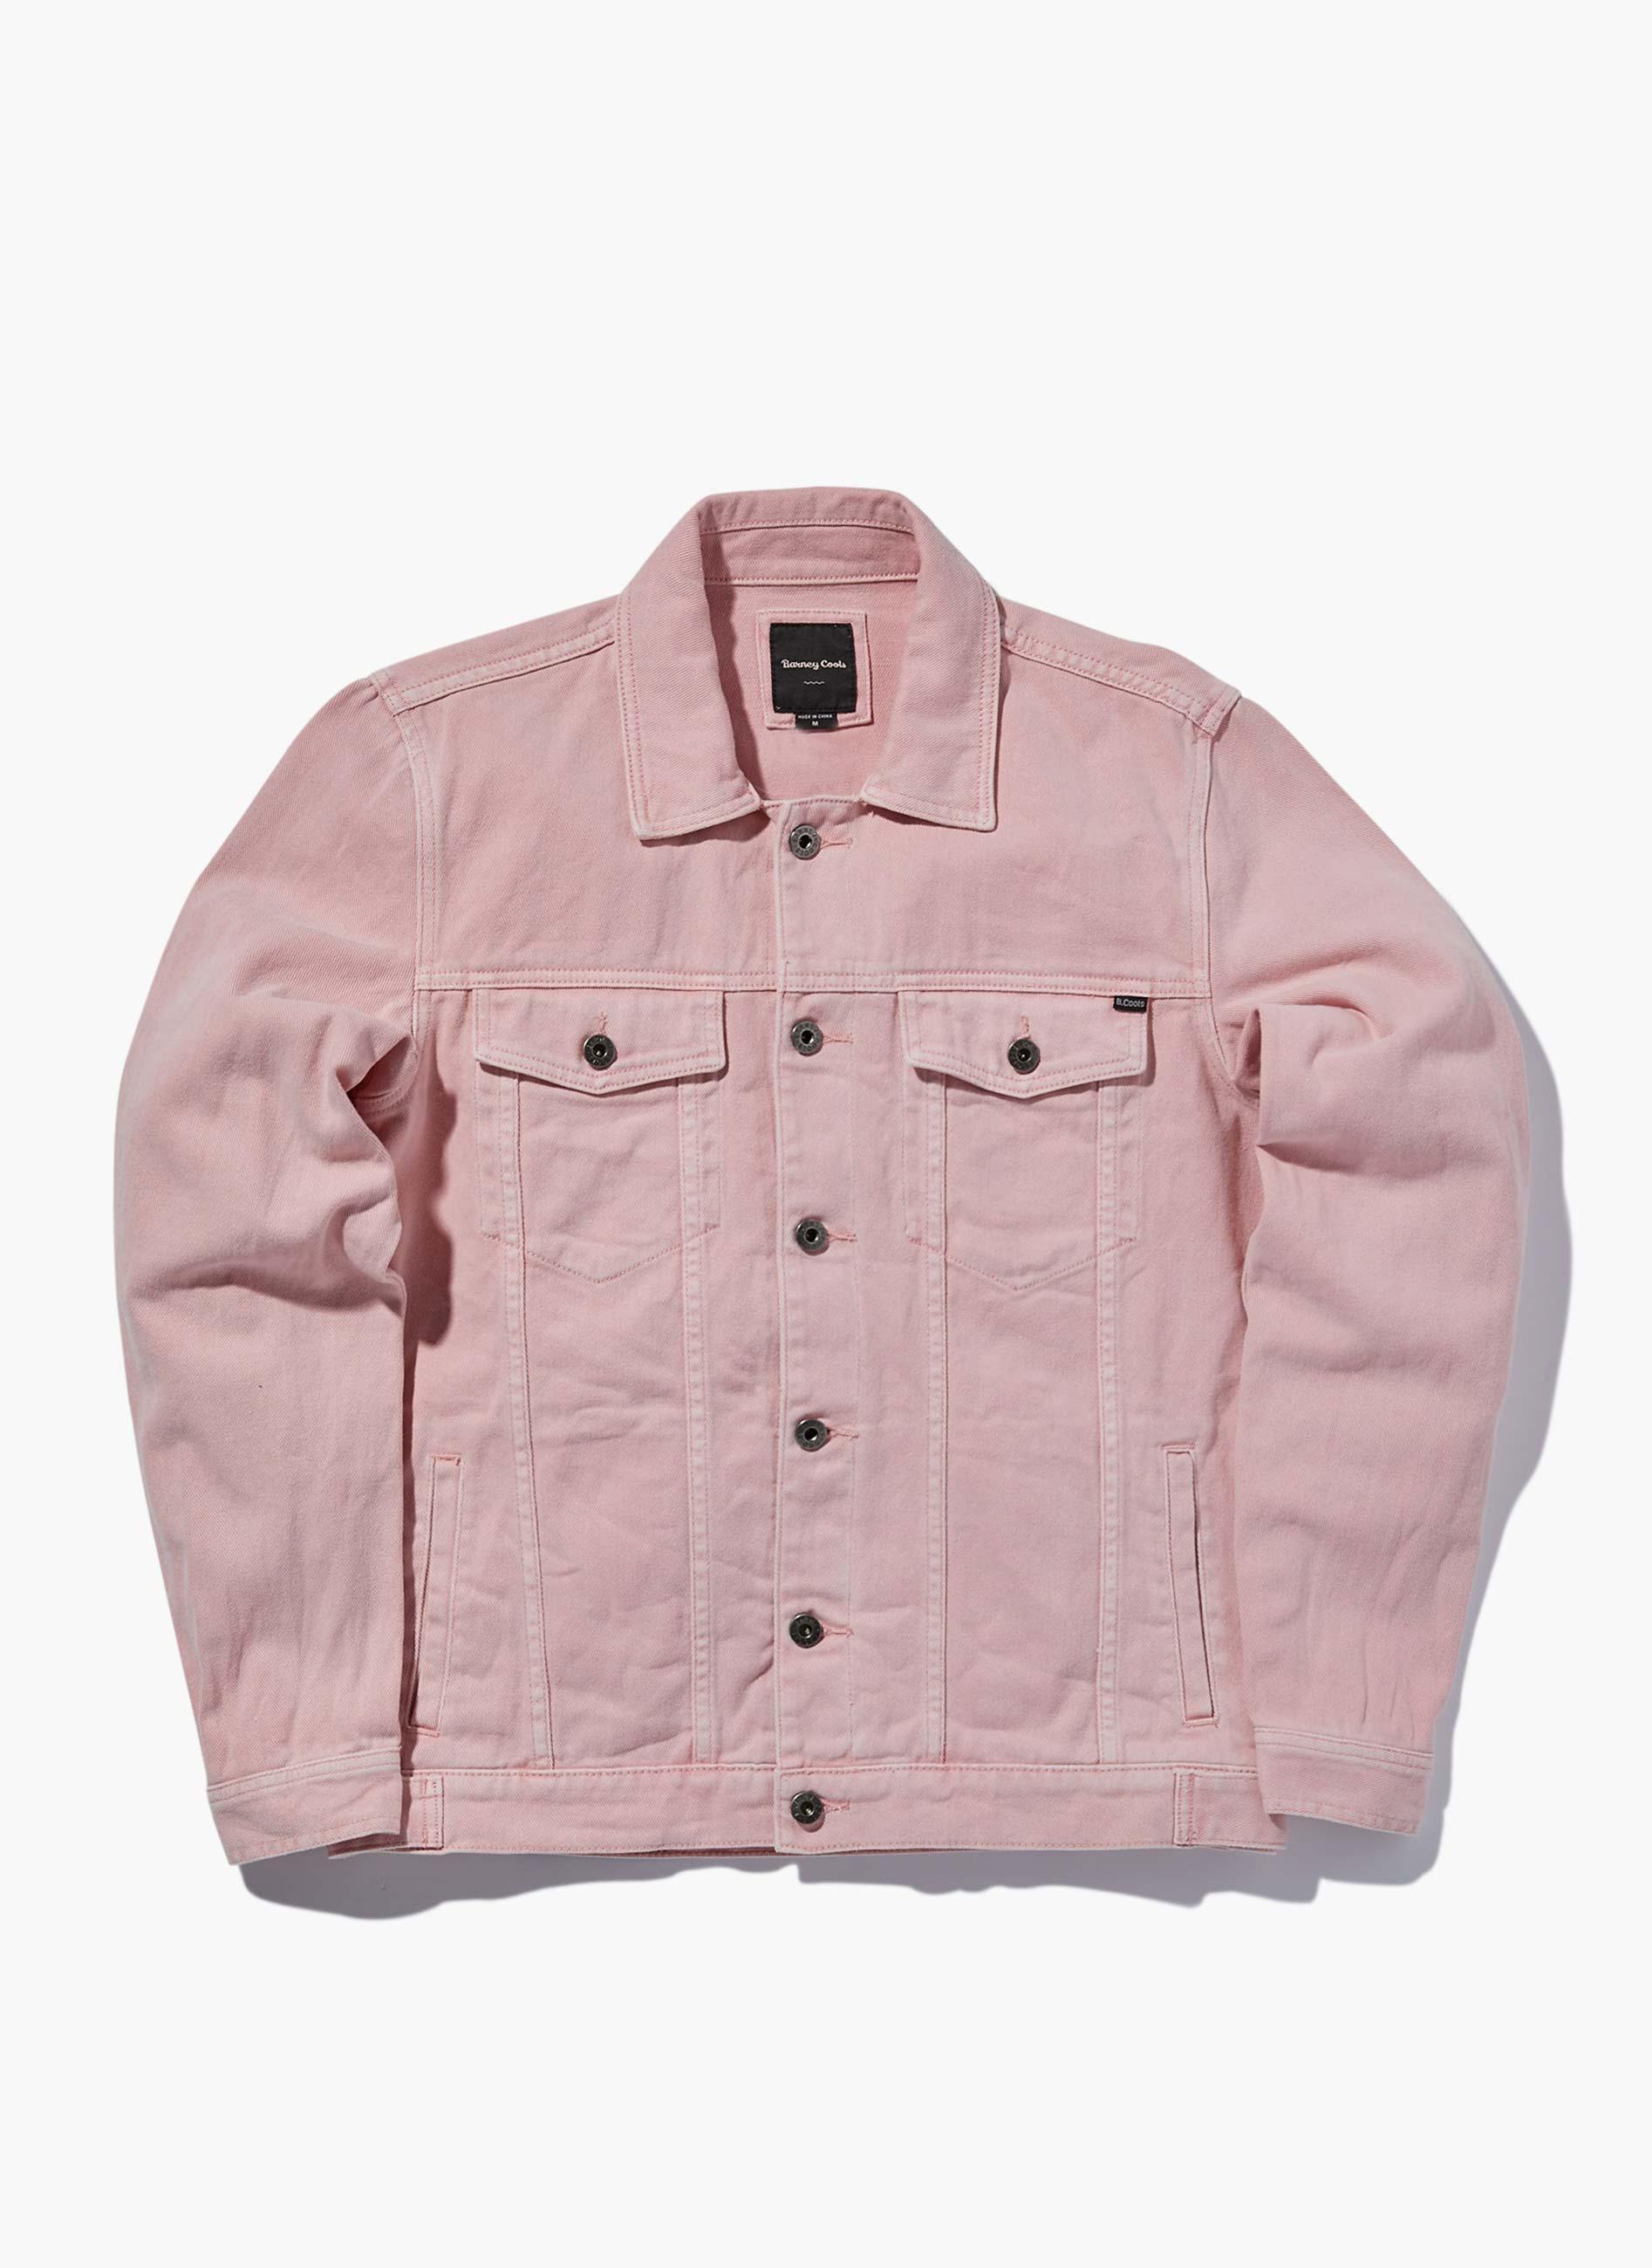 Barney Cools B.Rigid-Jacket-pink.jpg